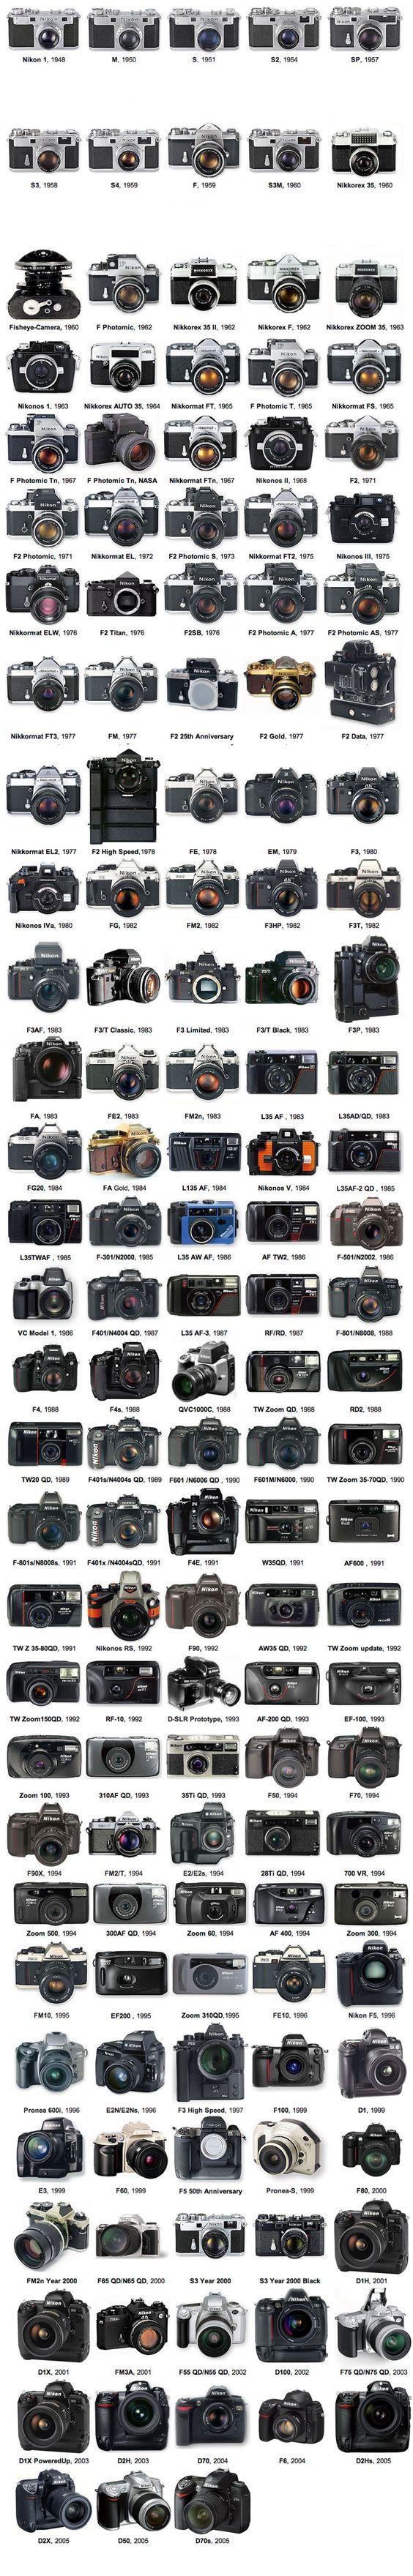 Nikon cameras timeline